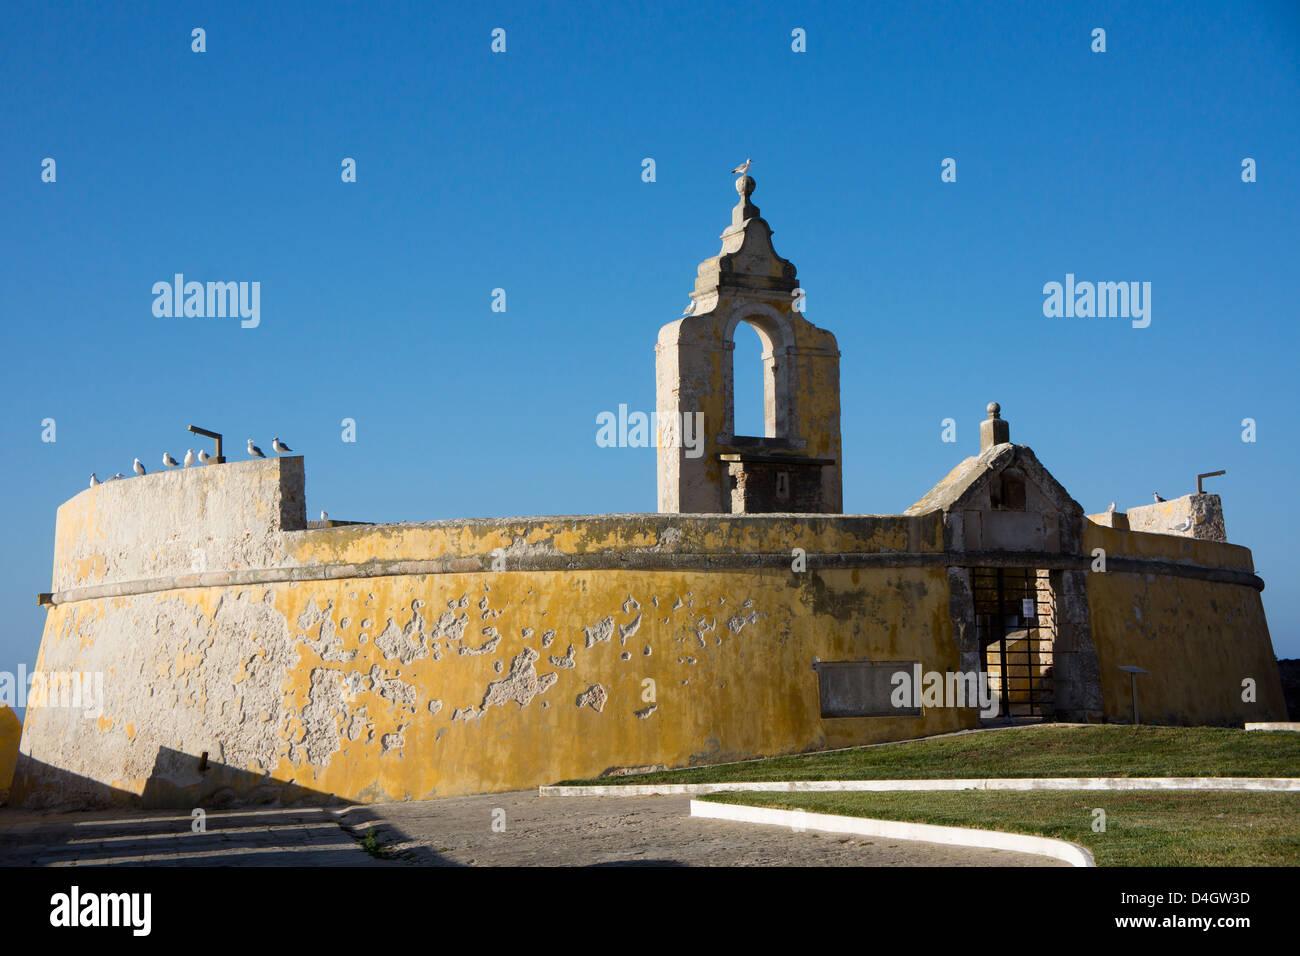 The 16th century fort at Peniche, Centro, Portugal - Stock Image